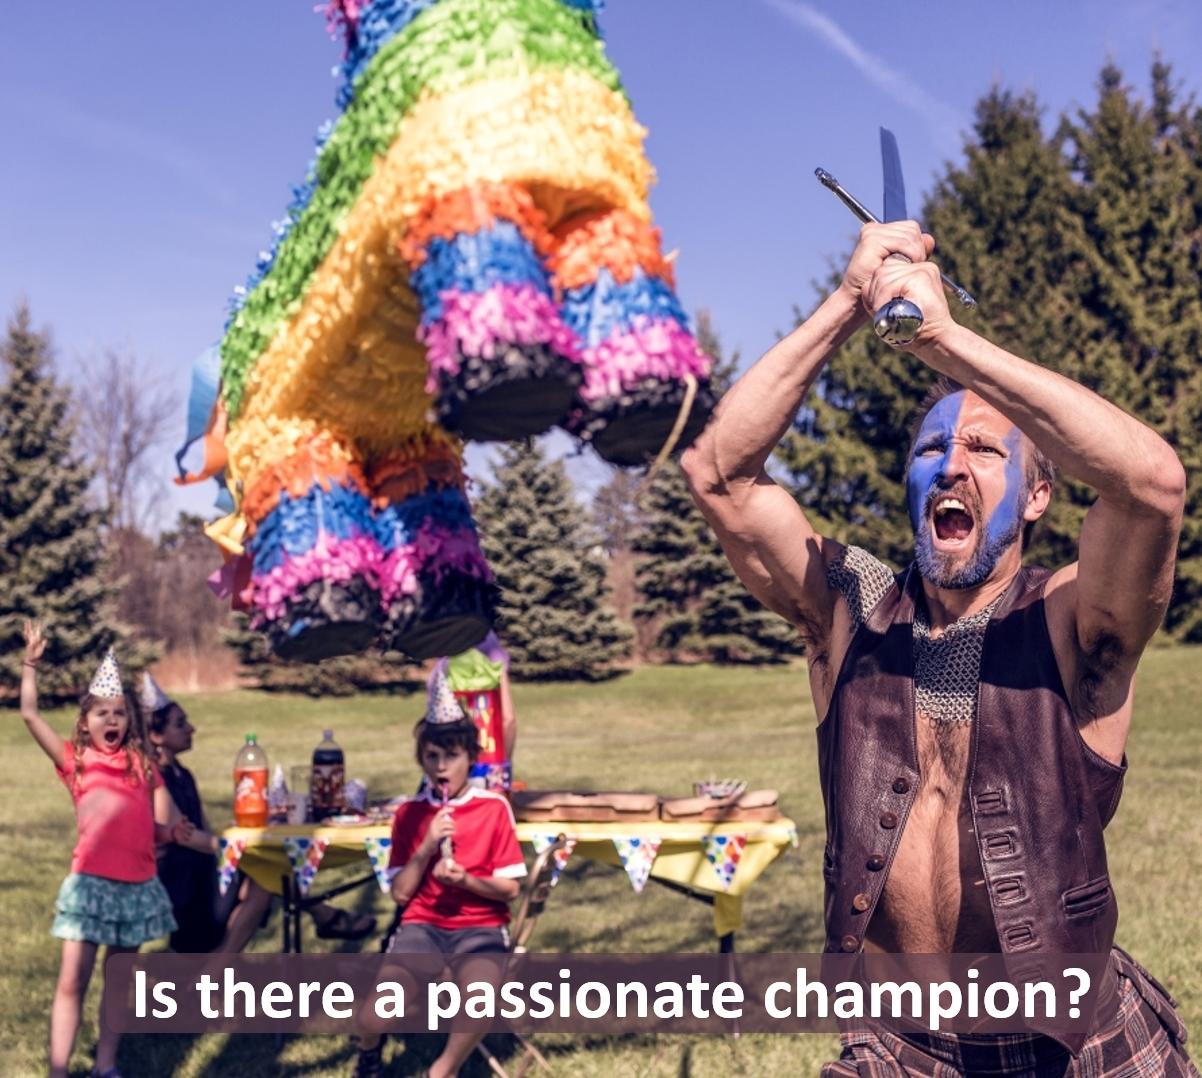 Passionate champion image